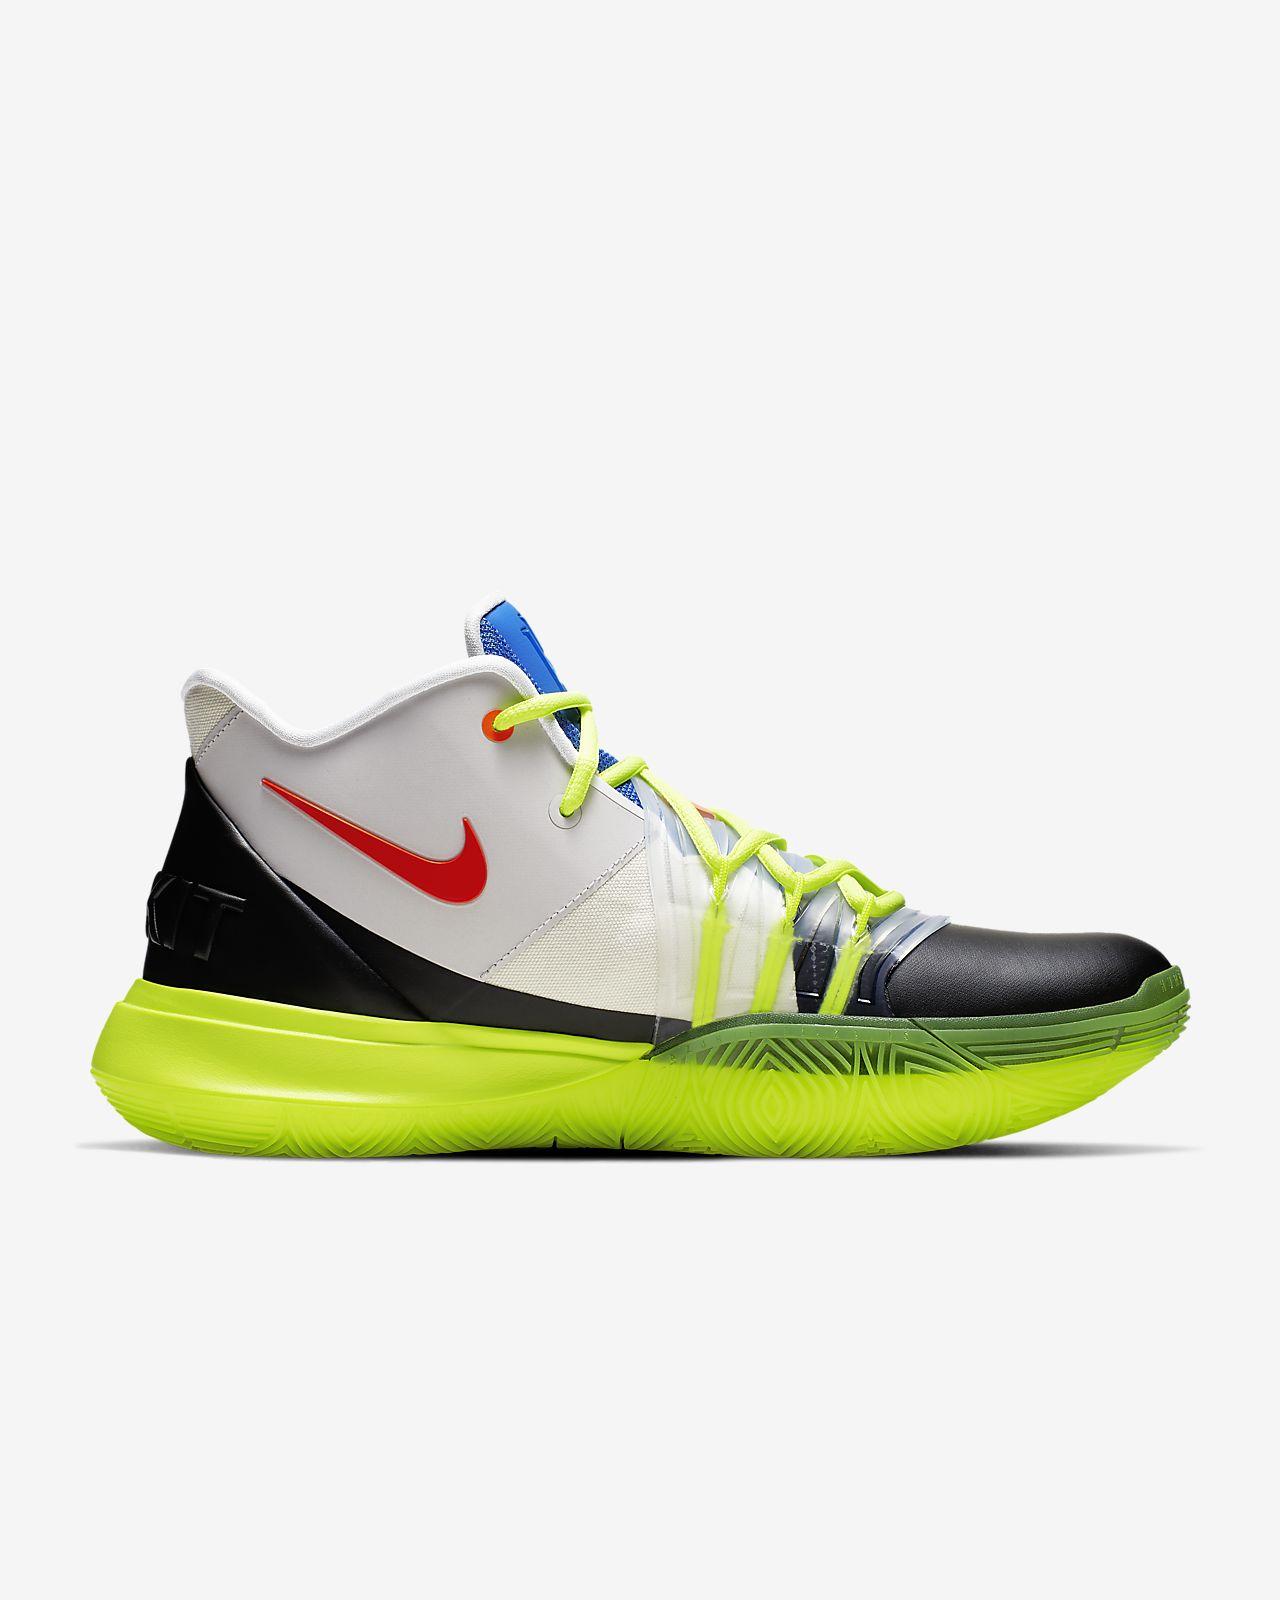 f248e691d653 Kyrie 5 x ROKIT All Star Basketball Shoe. Nike.com